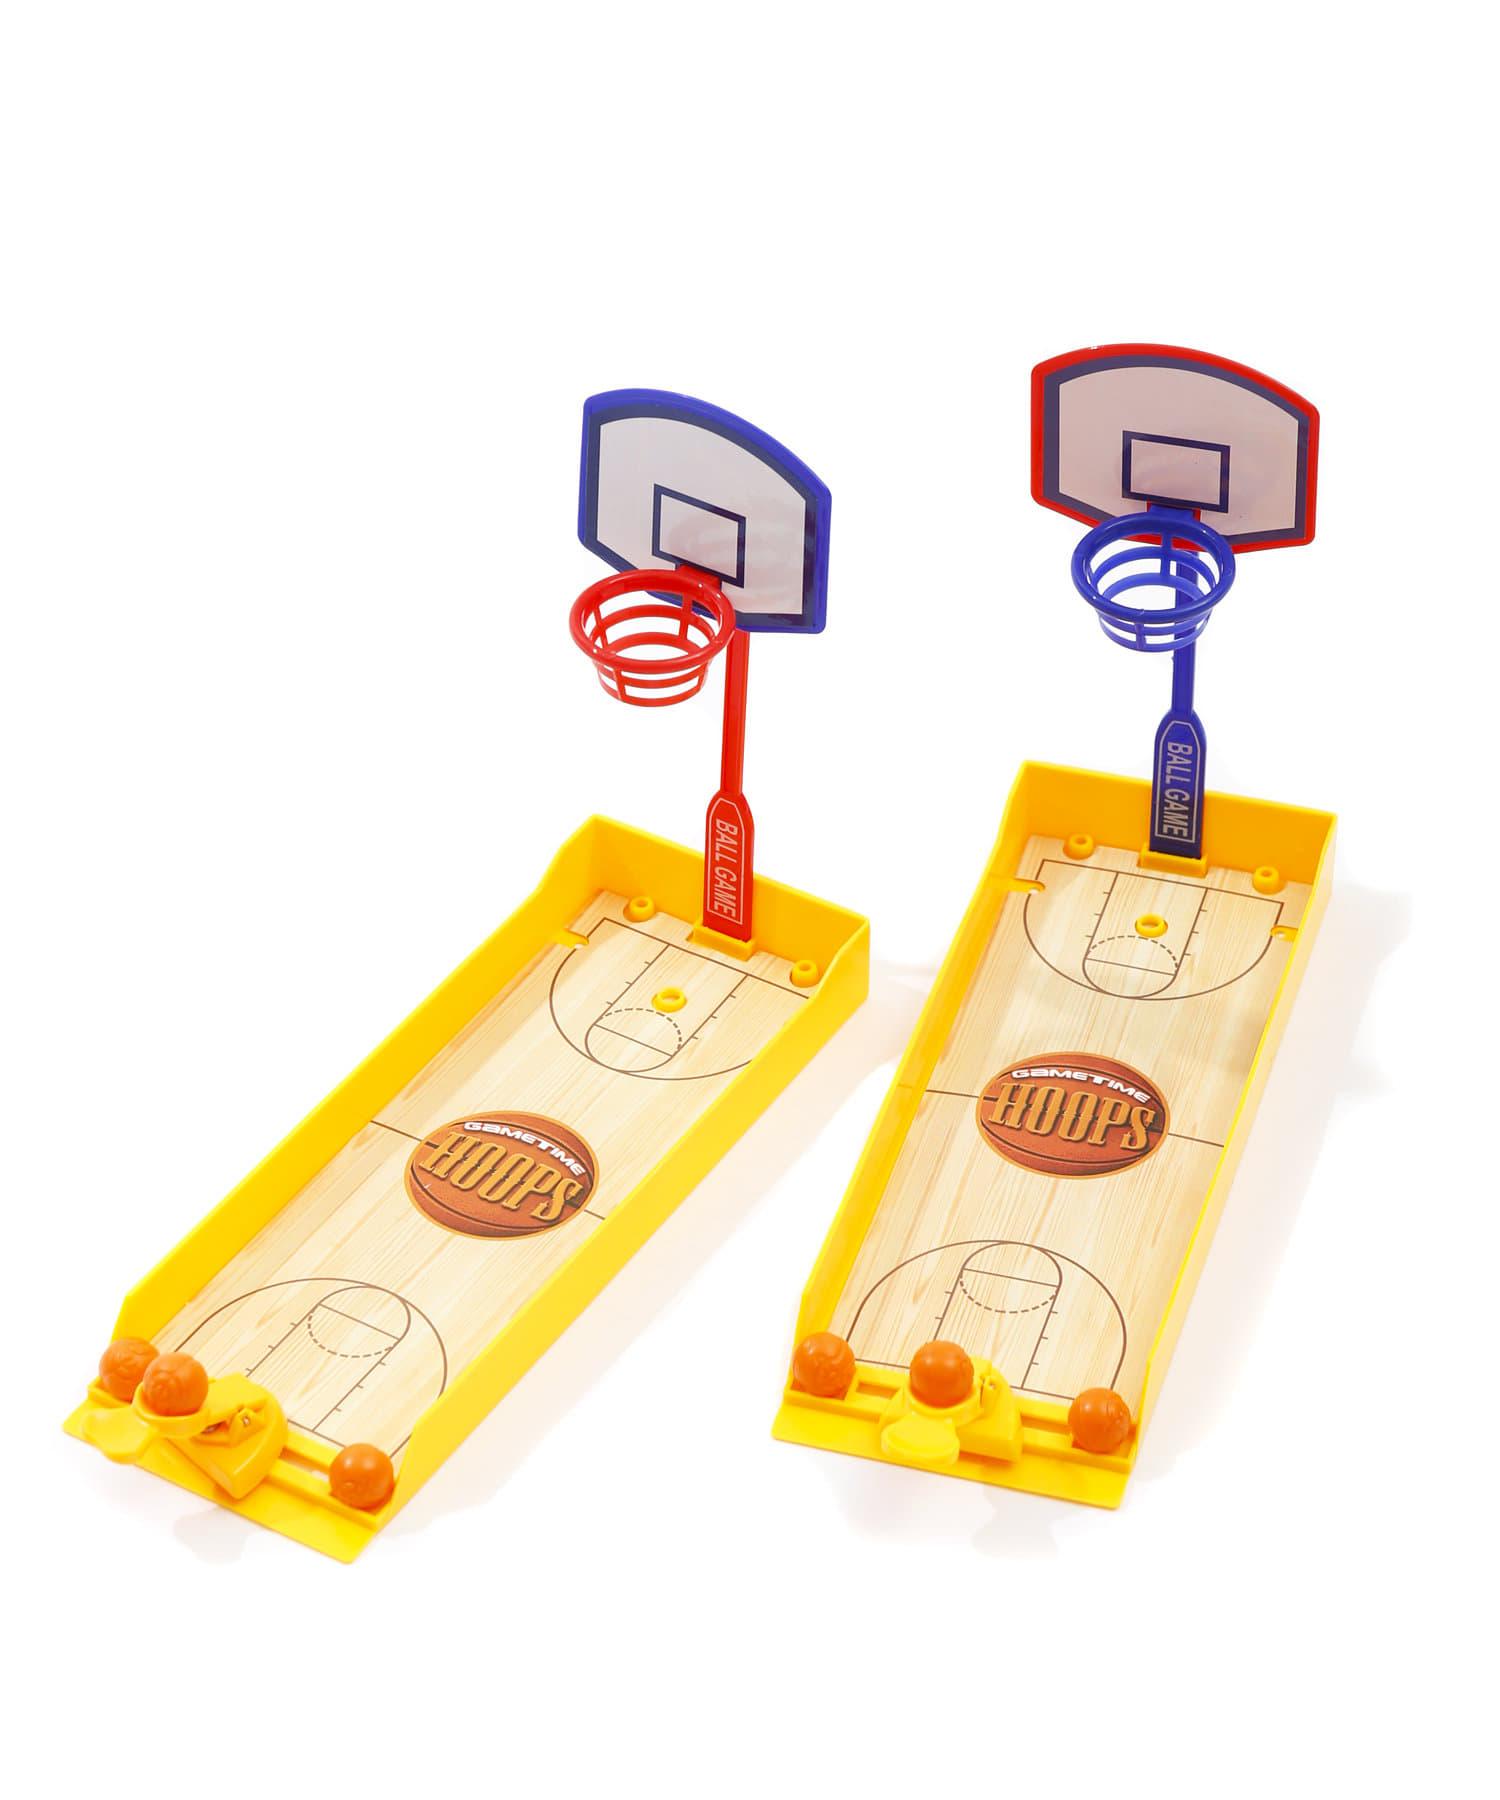 3COINS(スリーコインズ) 【ASOKO】【指部】フィンガーバスケットボール《色はランダム》